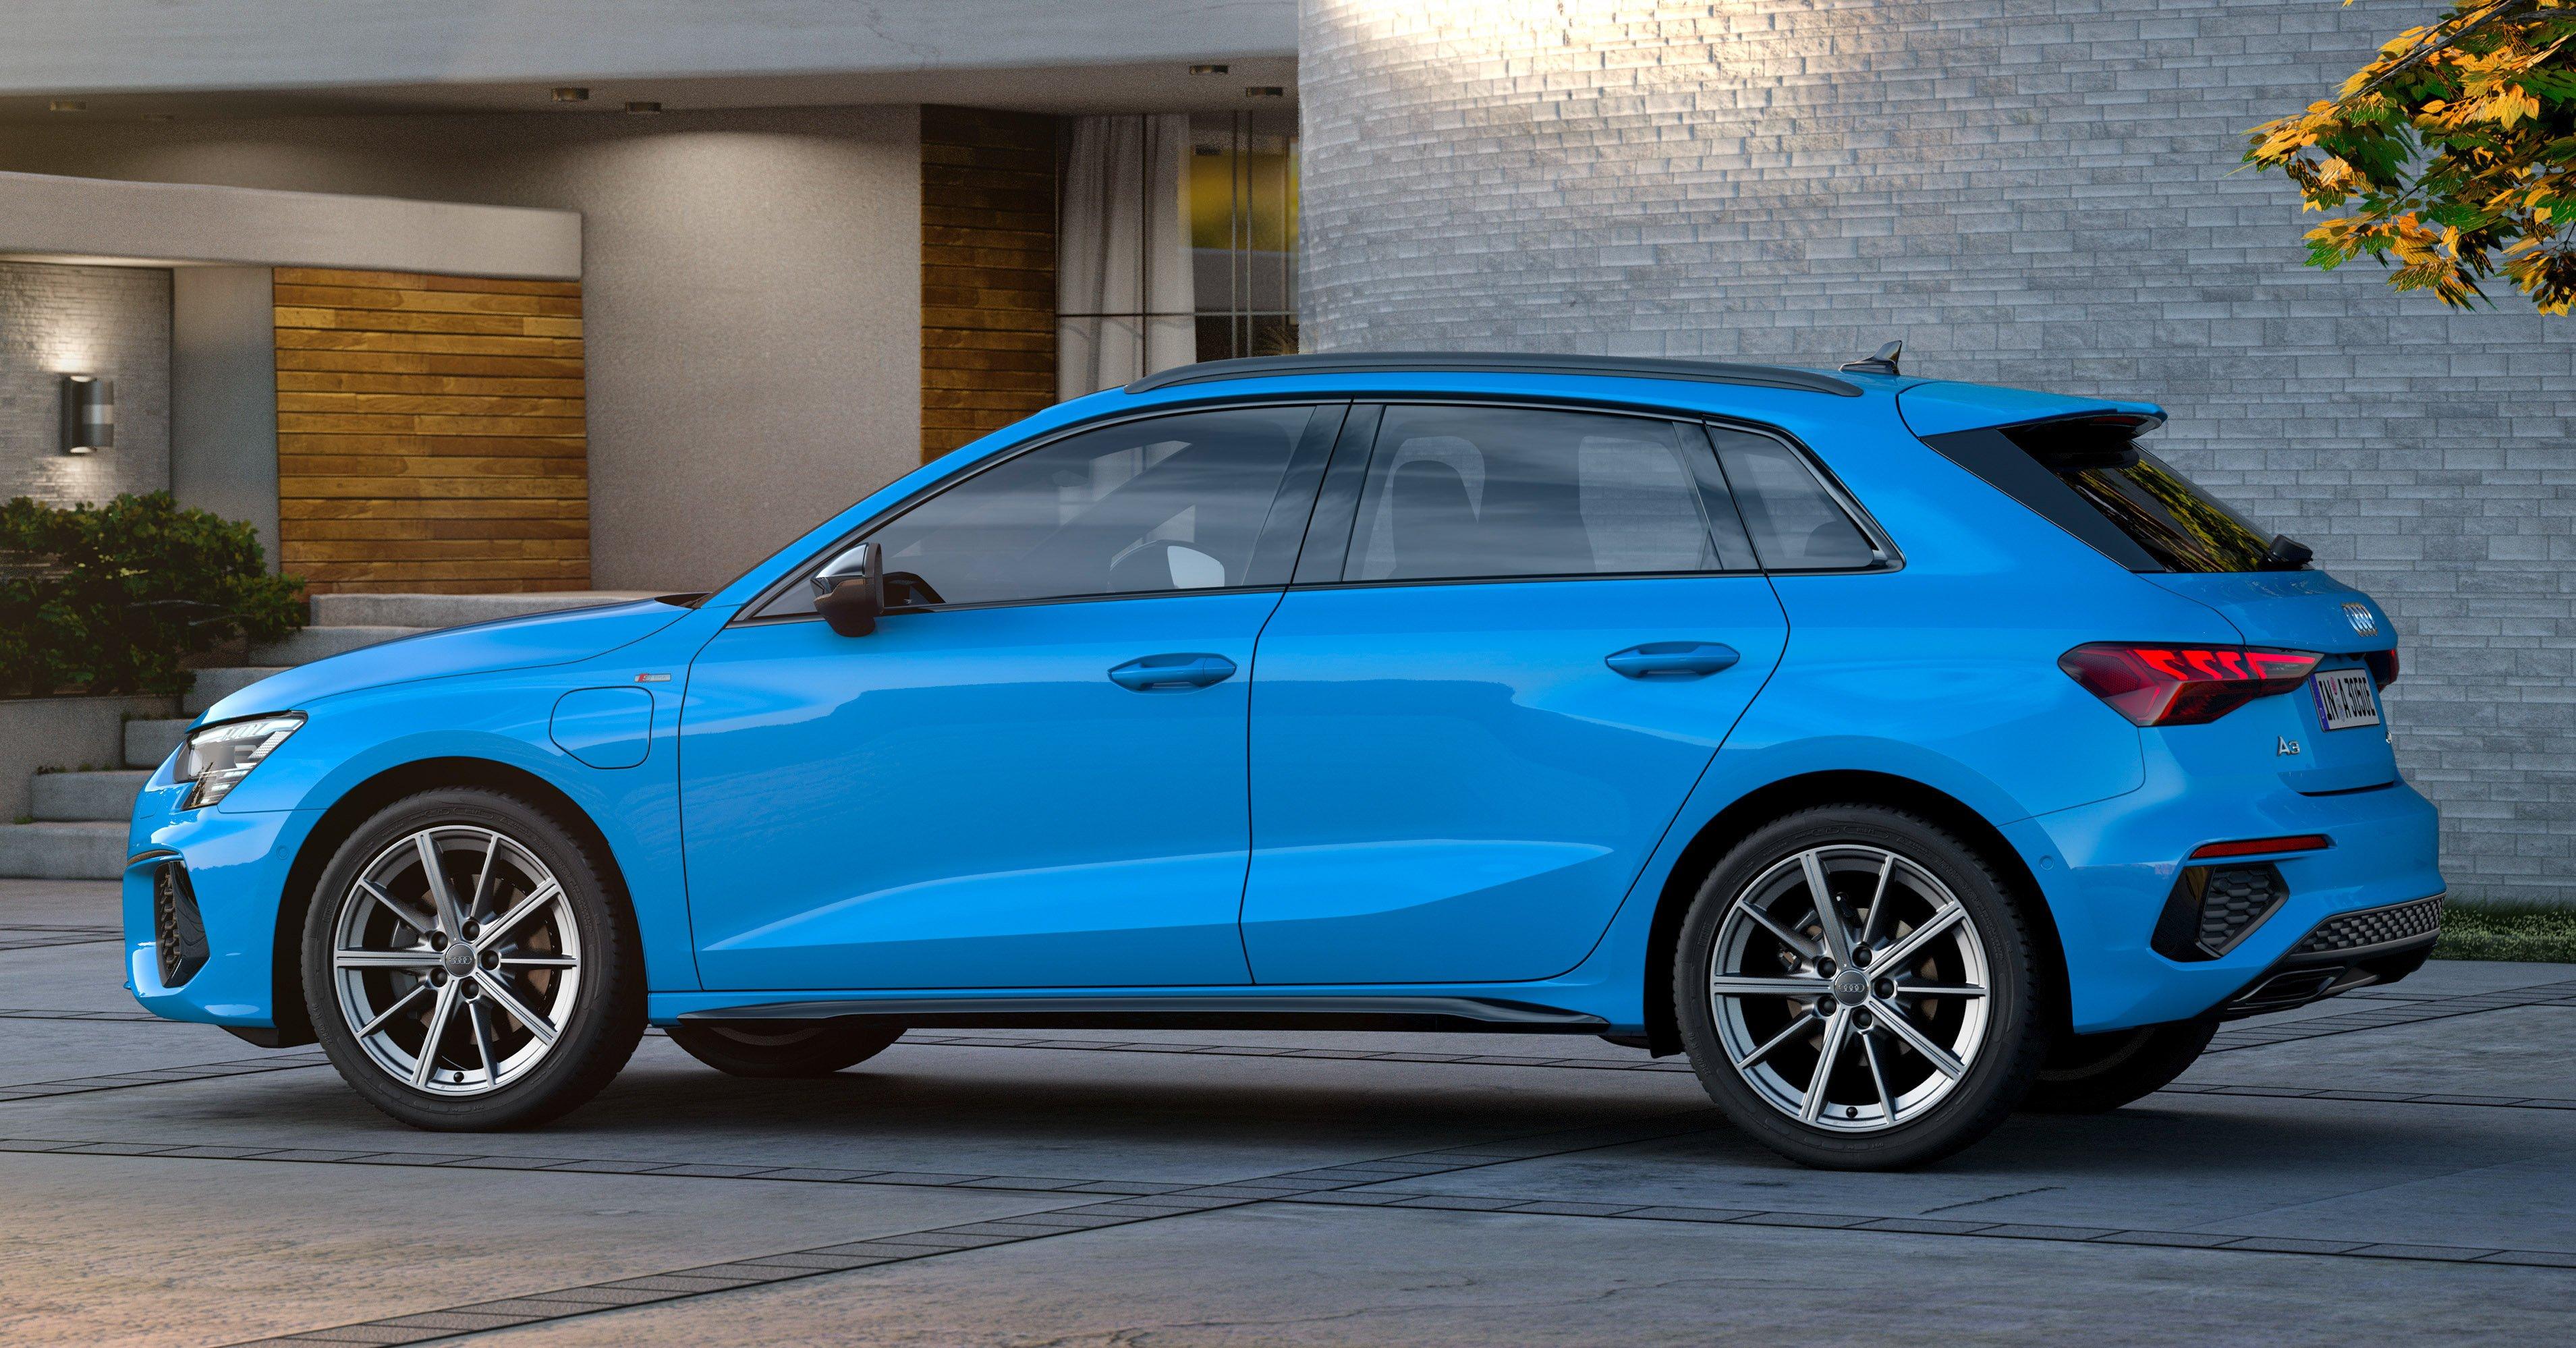 2021 Audi A3 Sportback 40 TFSI e unveiled - 1.4L PHEV with ...